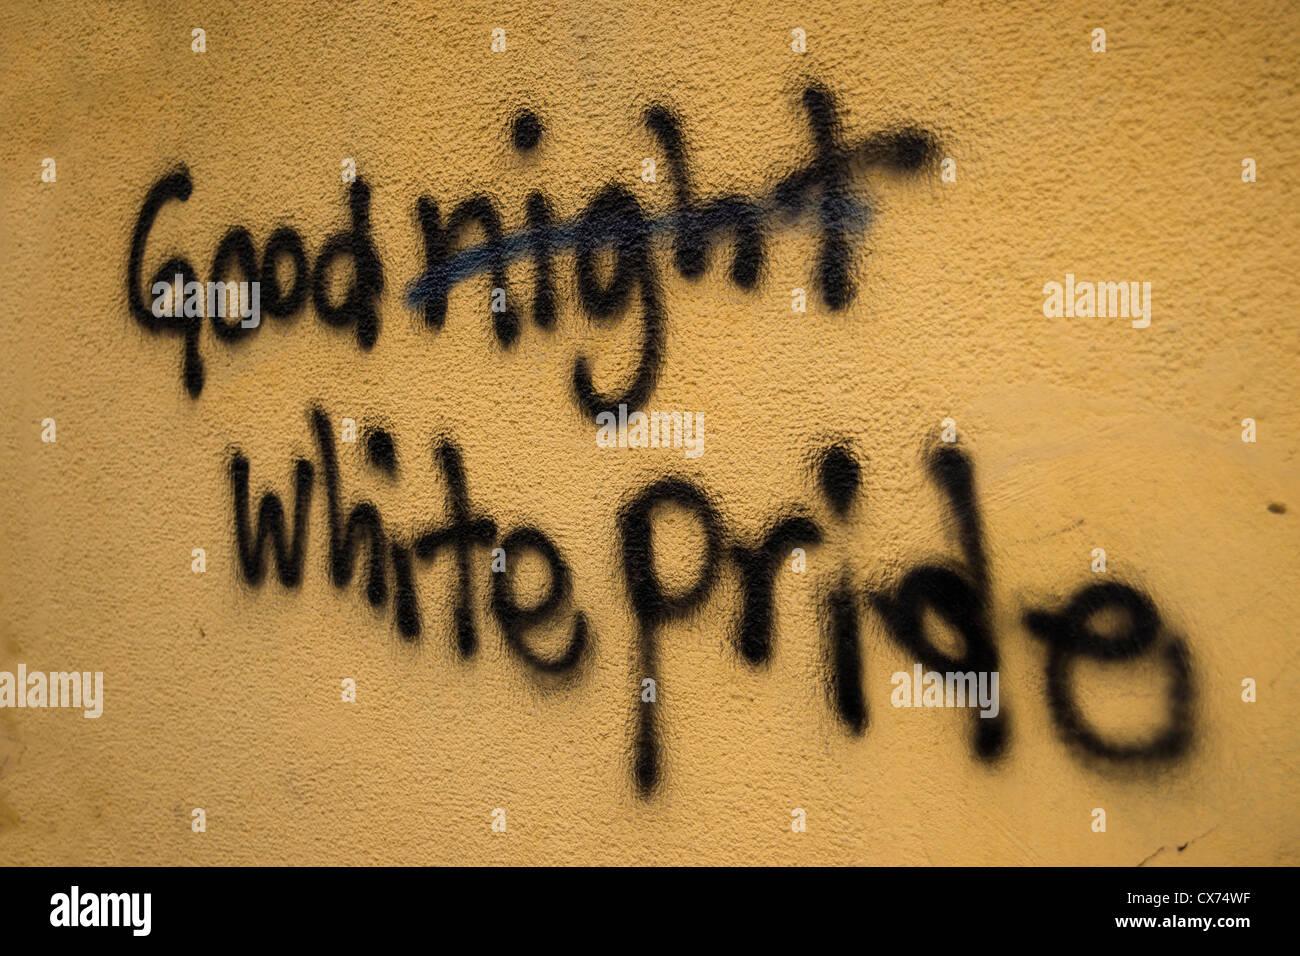 Good night White Pride  graffiti spray painting on yellow wall in Krakow - Stock Image